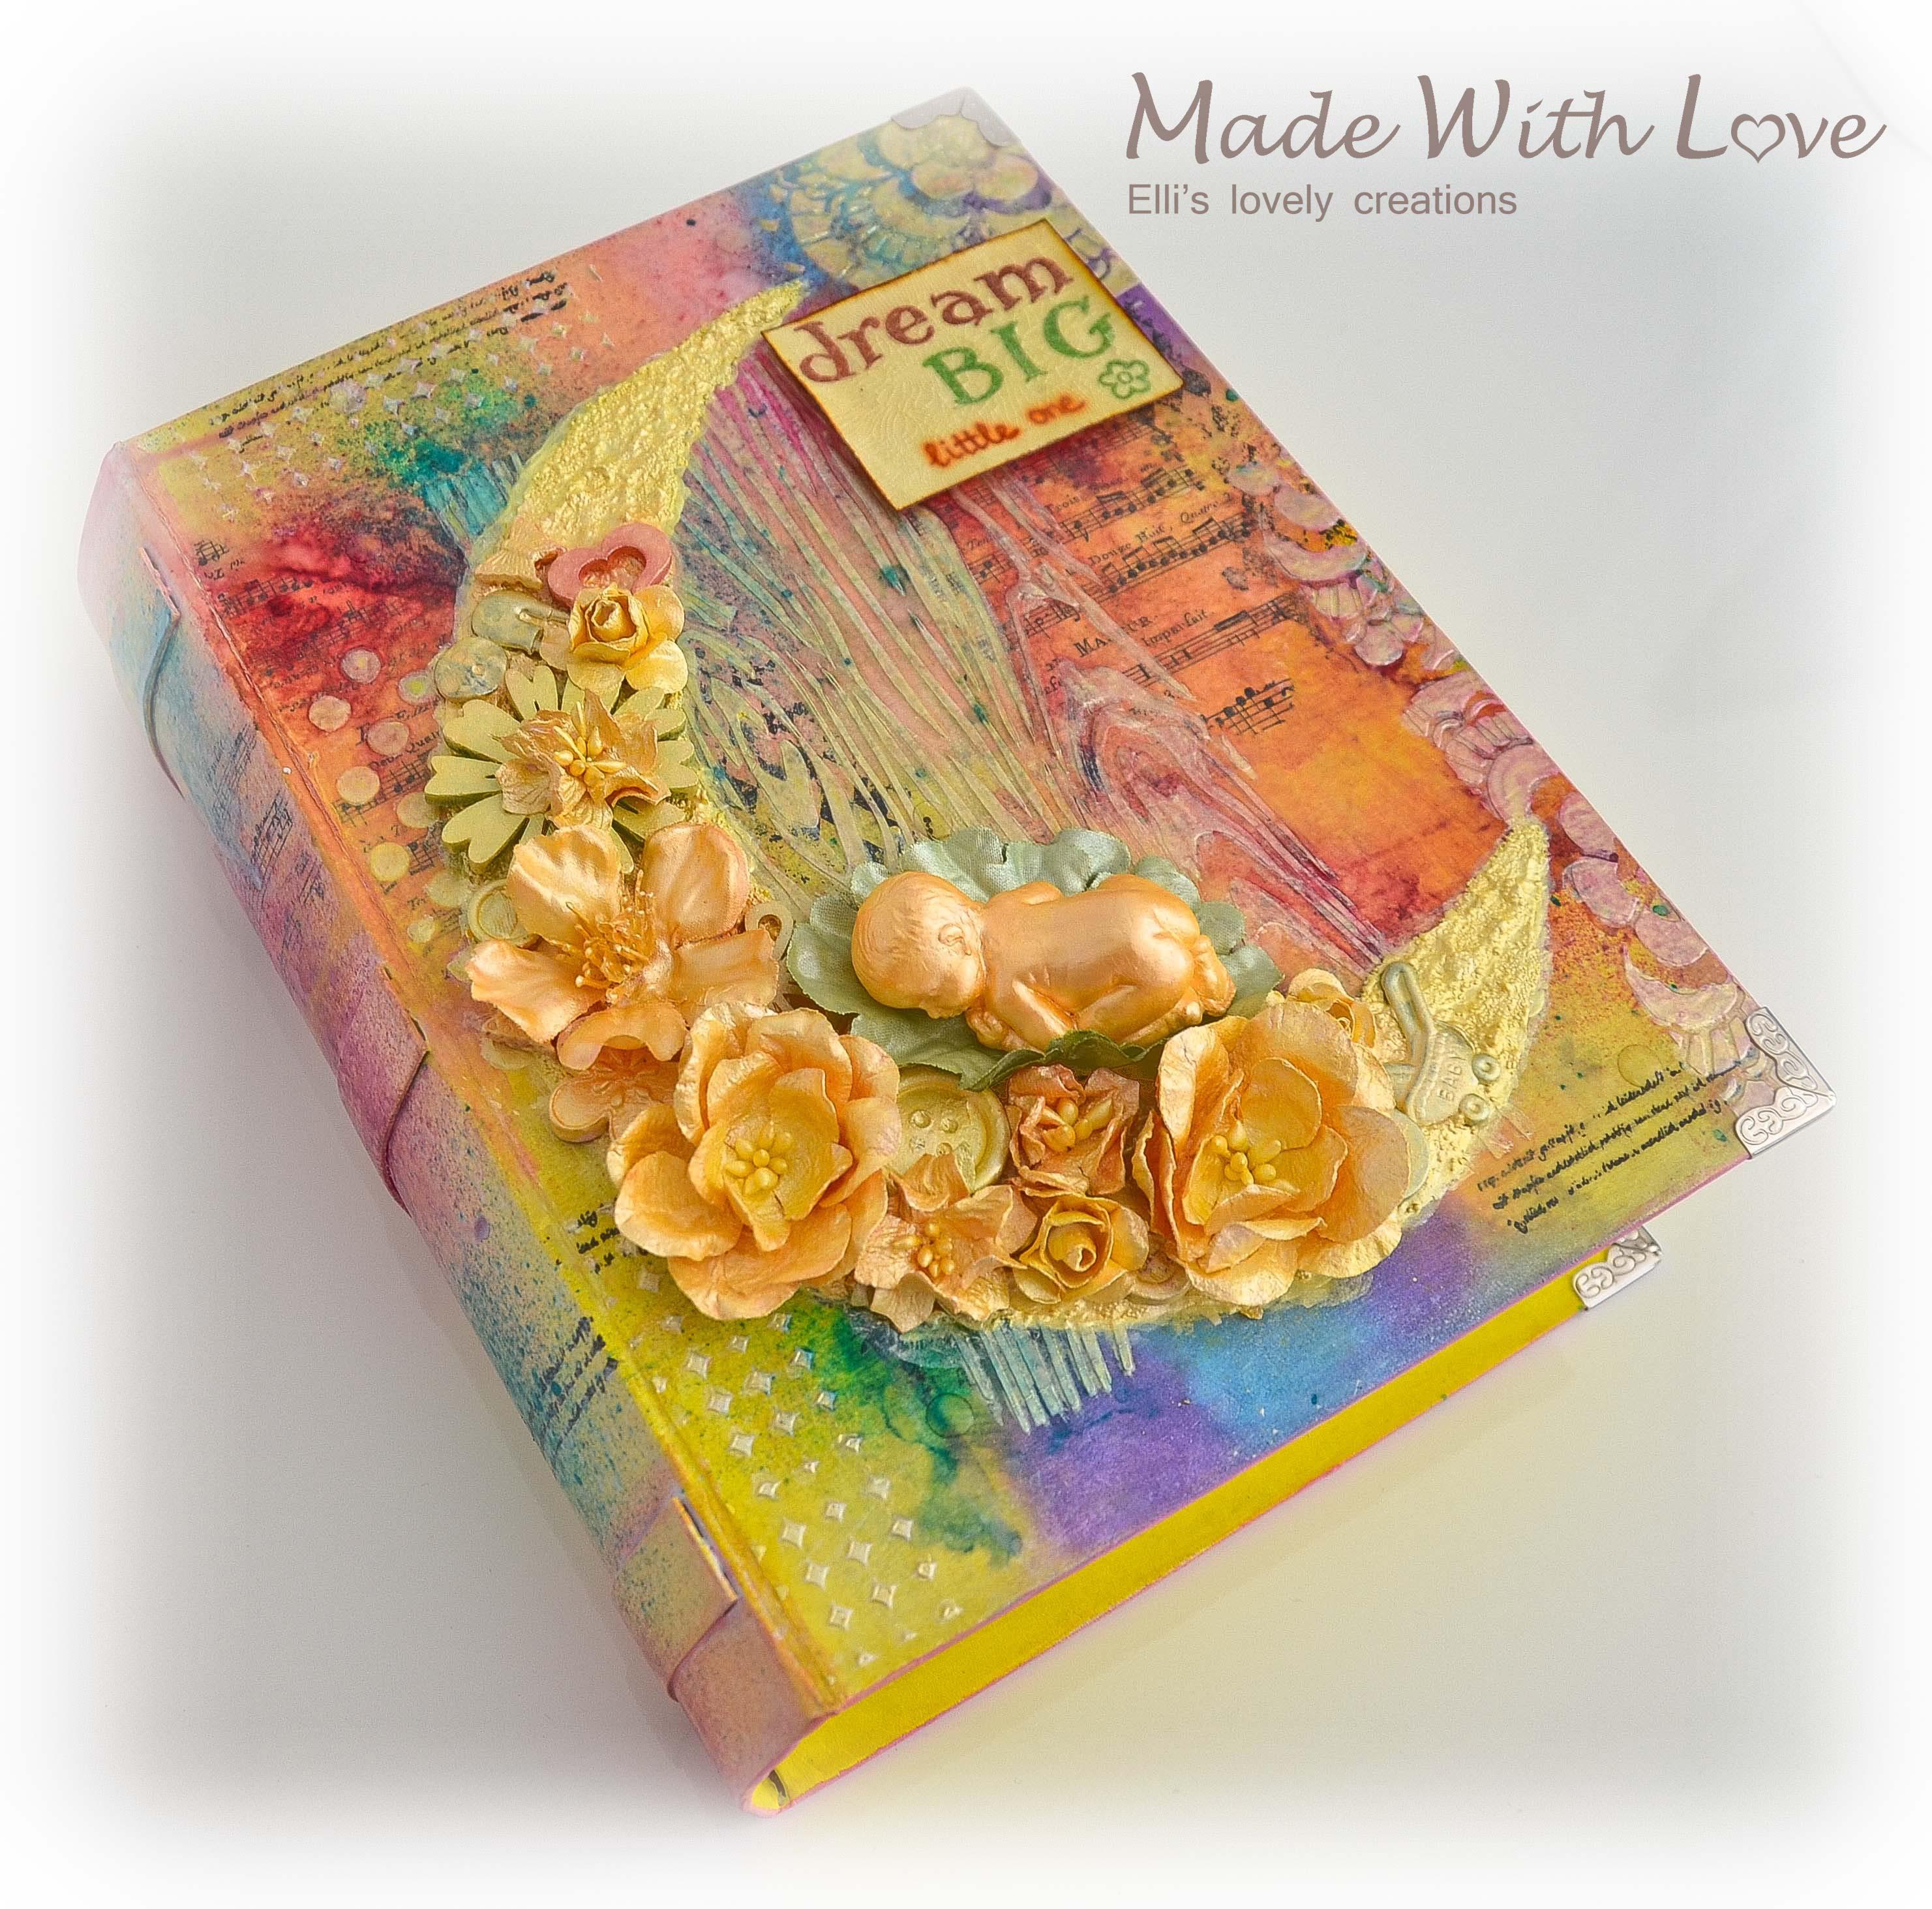 Mixed Media Baby Precious Book Box 2